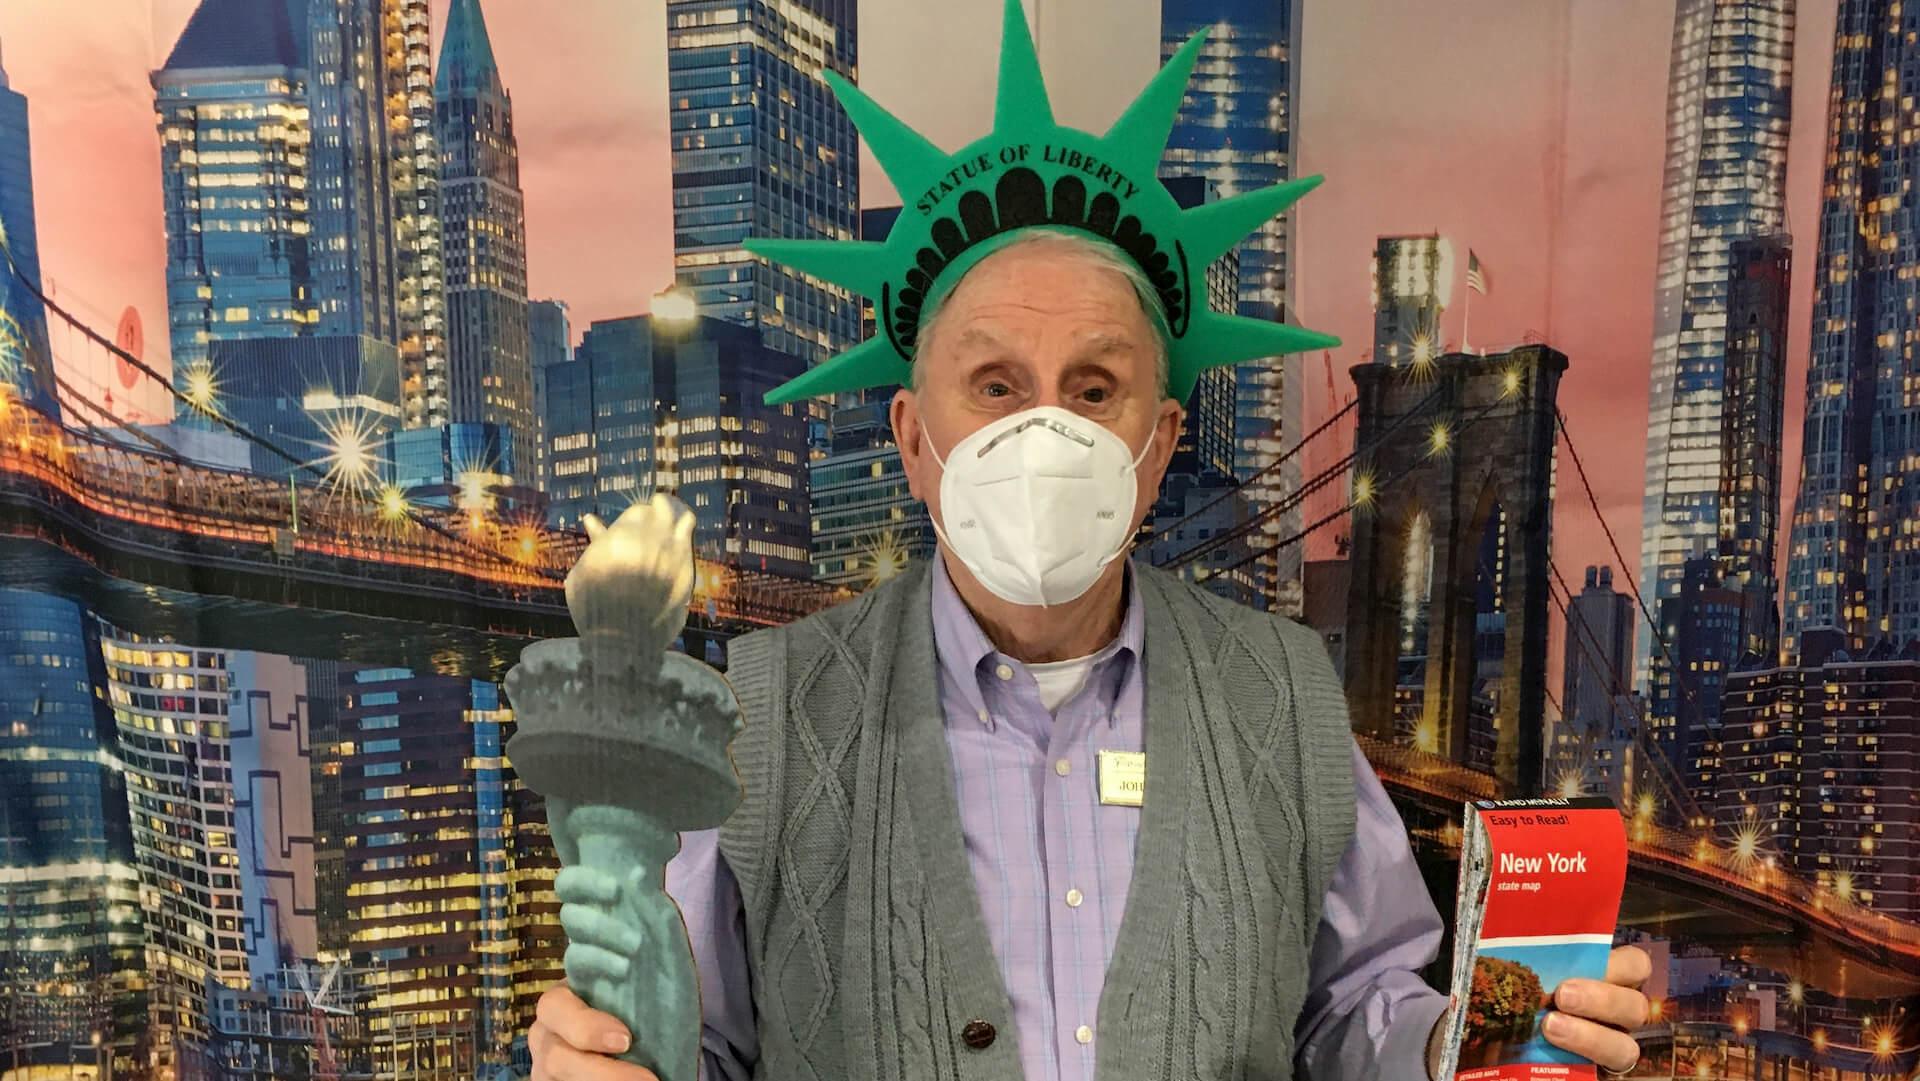 John armchair travels to New York